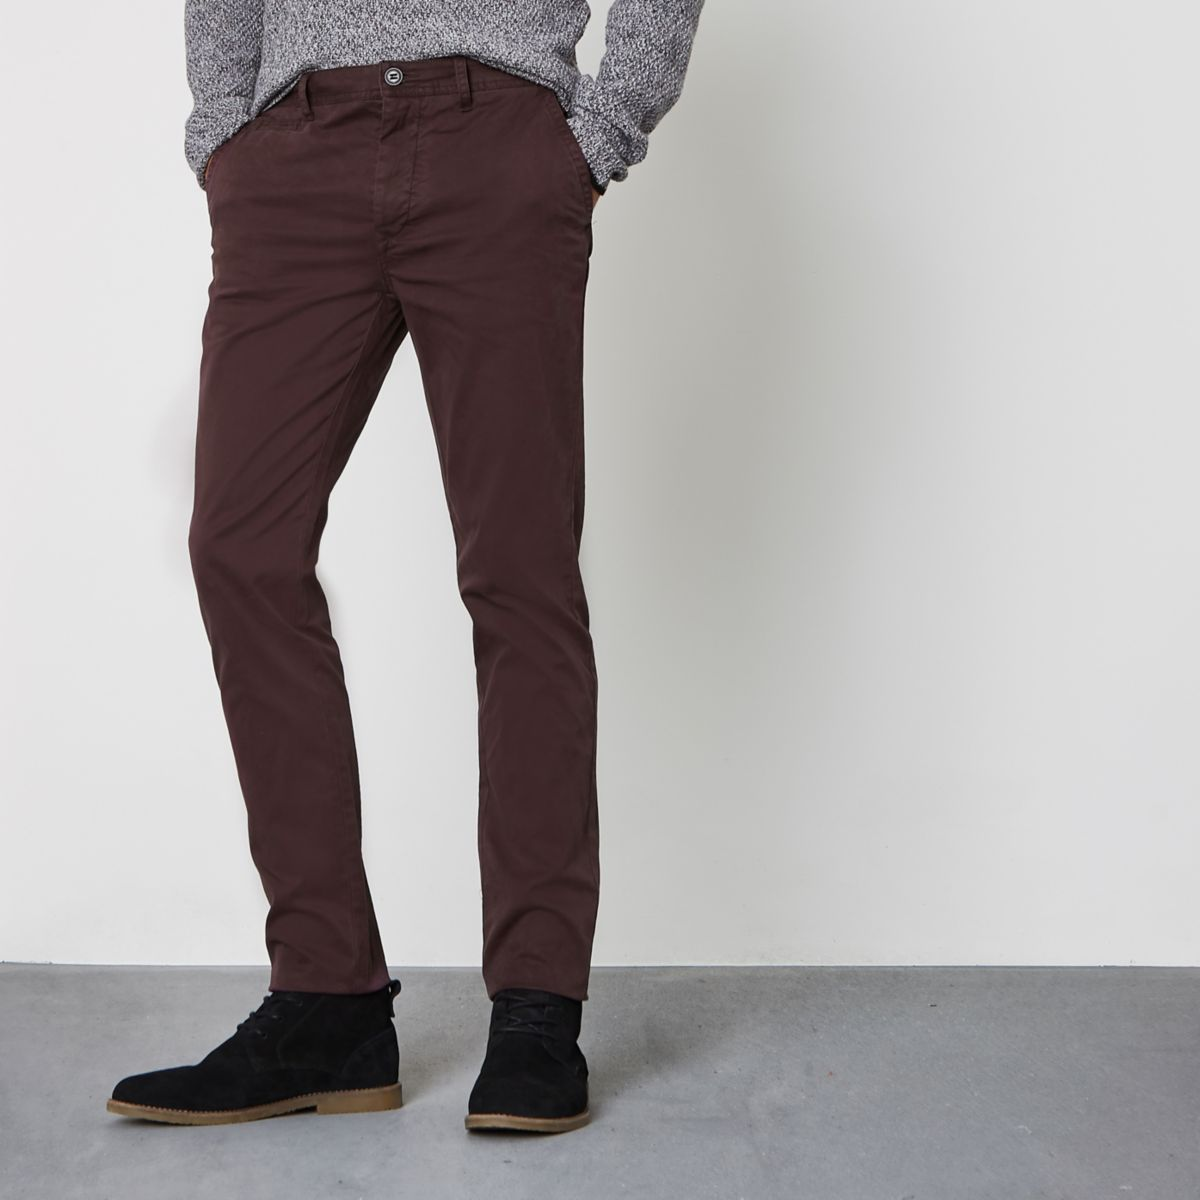 pantalon chino skinny rouge fonc pantalons soldes homme. Black Bedroom Furniture Sets. Home Design Ideas